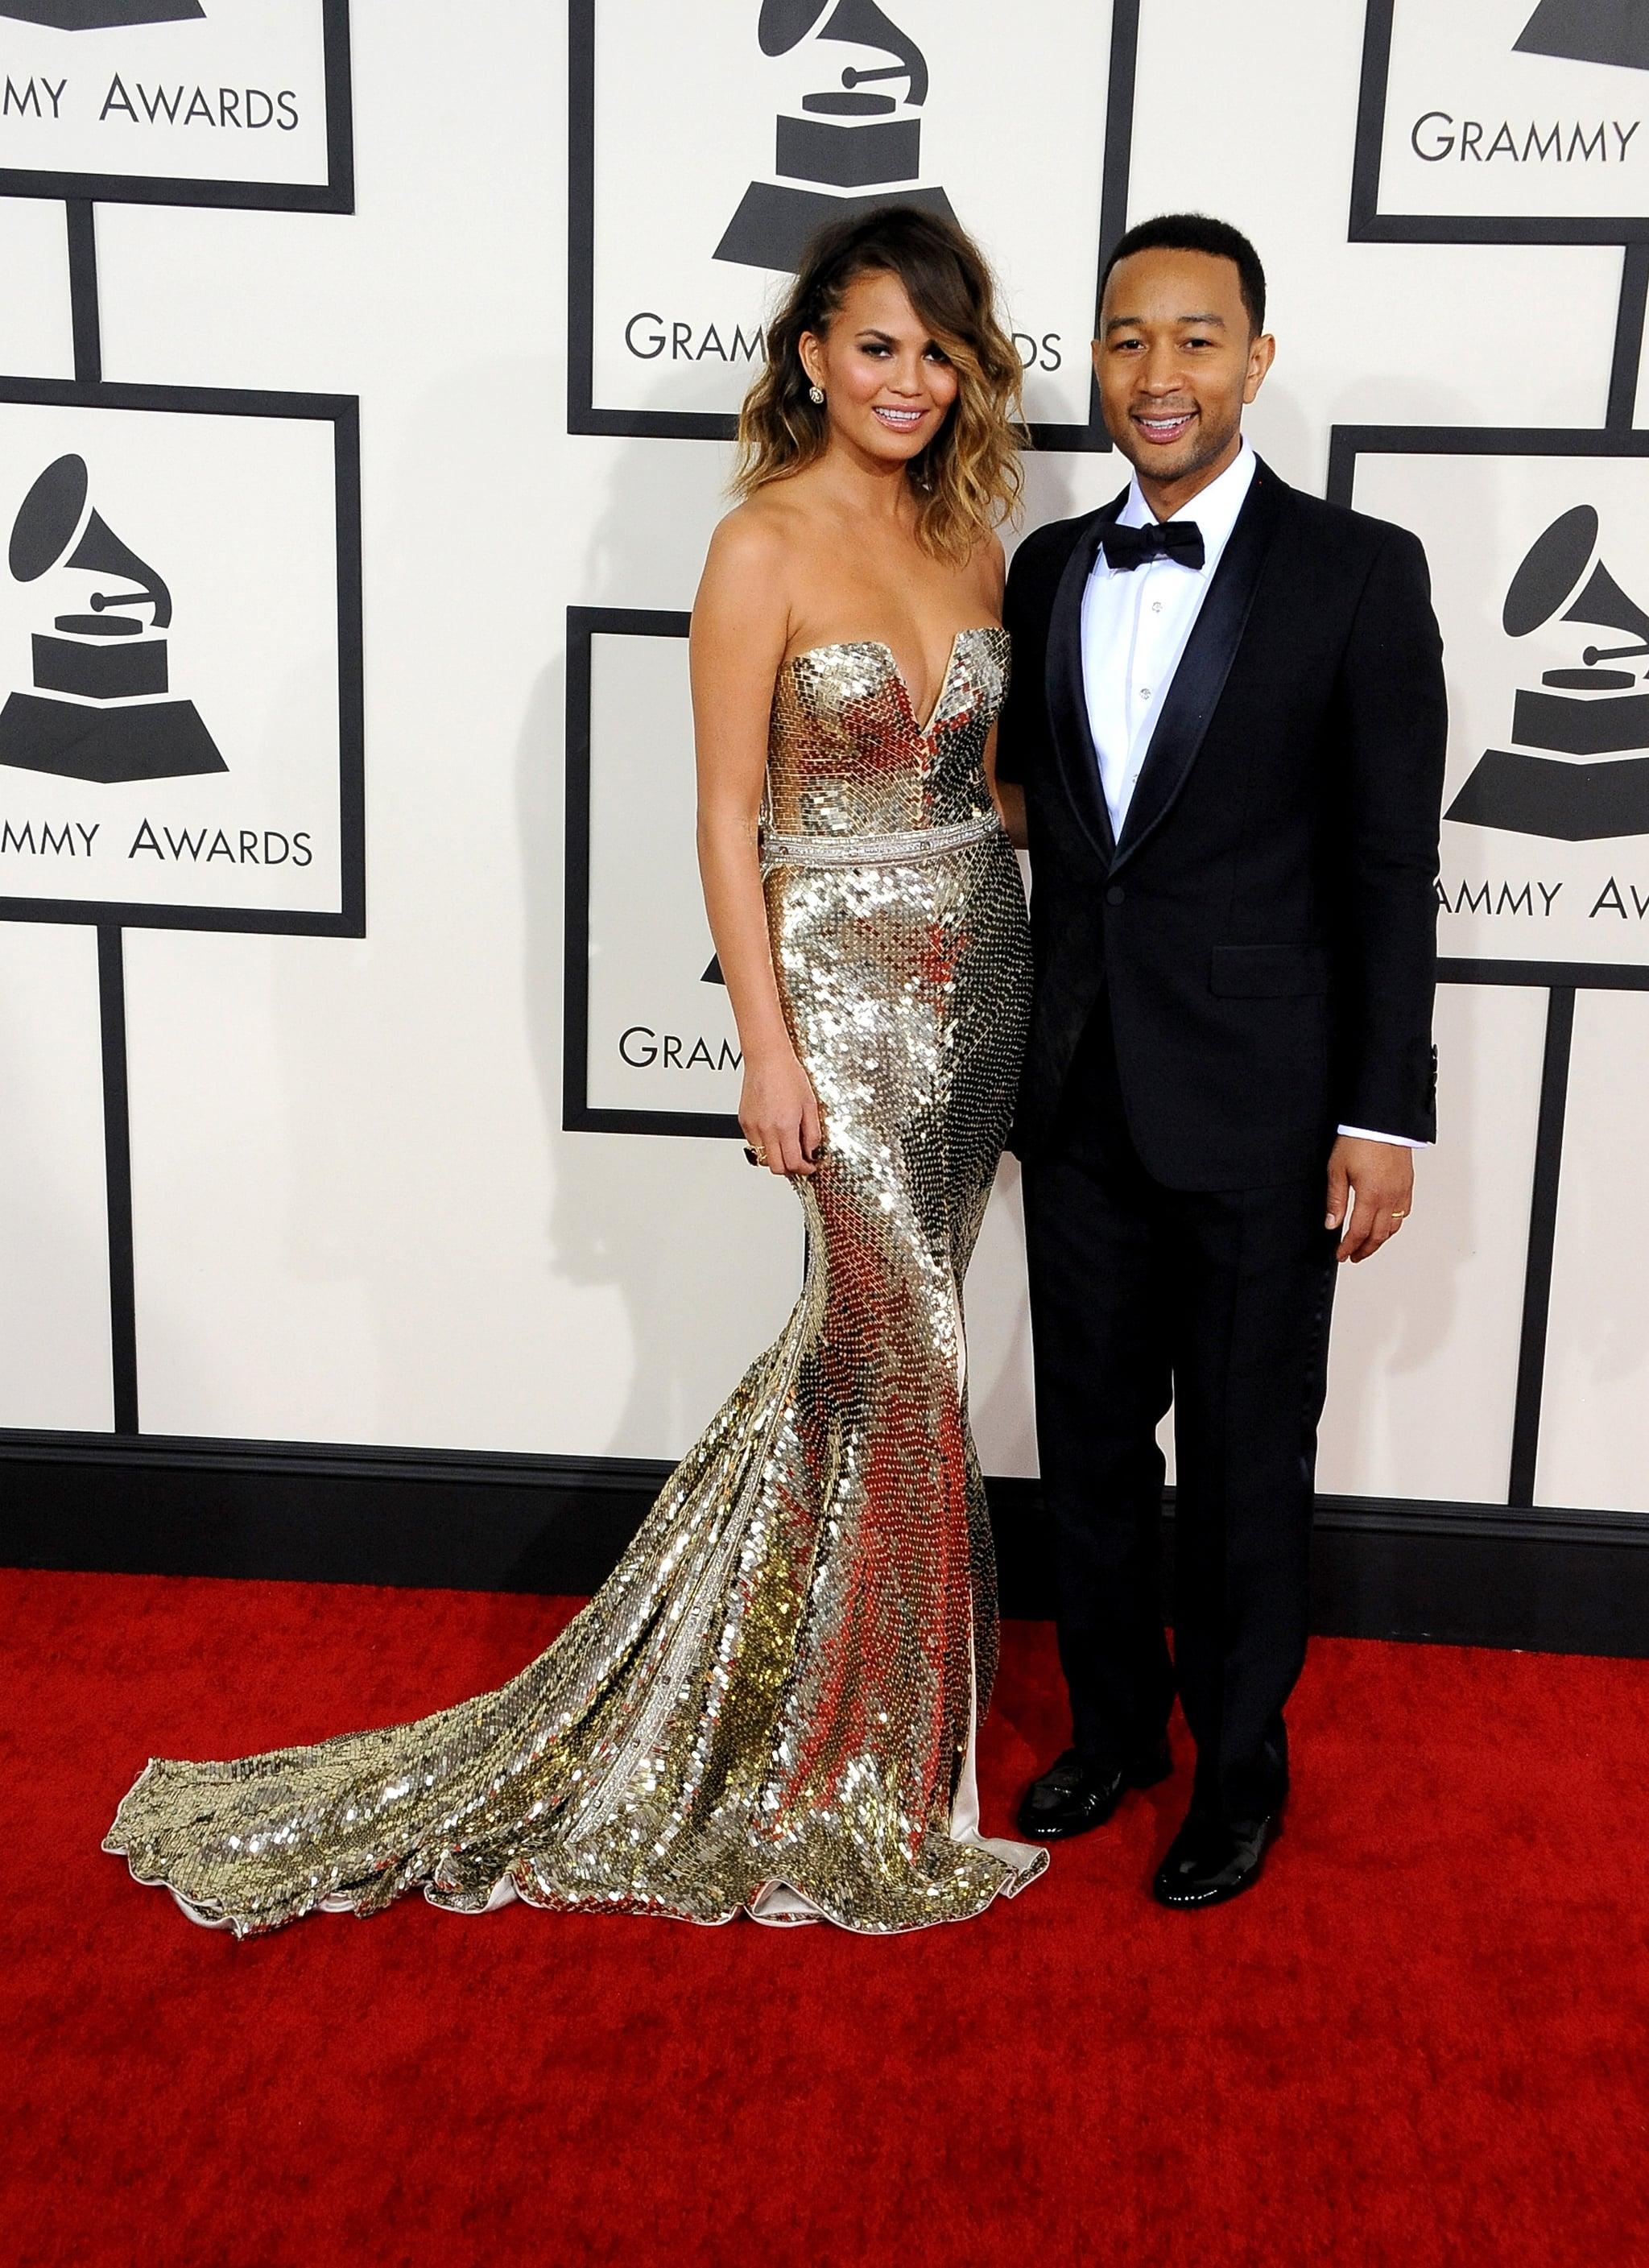 Chrissy Teigen and John Legend stunned at the Grammys.